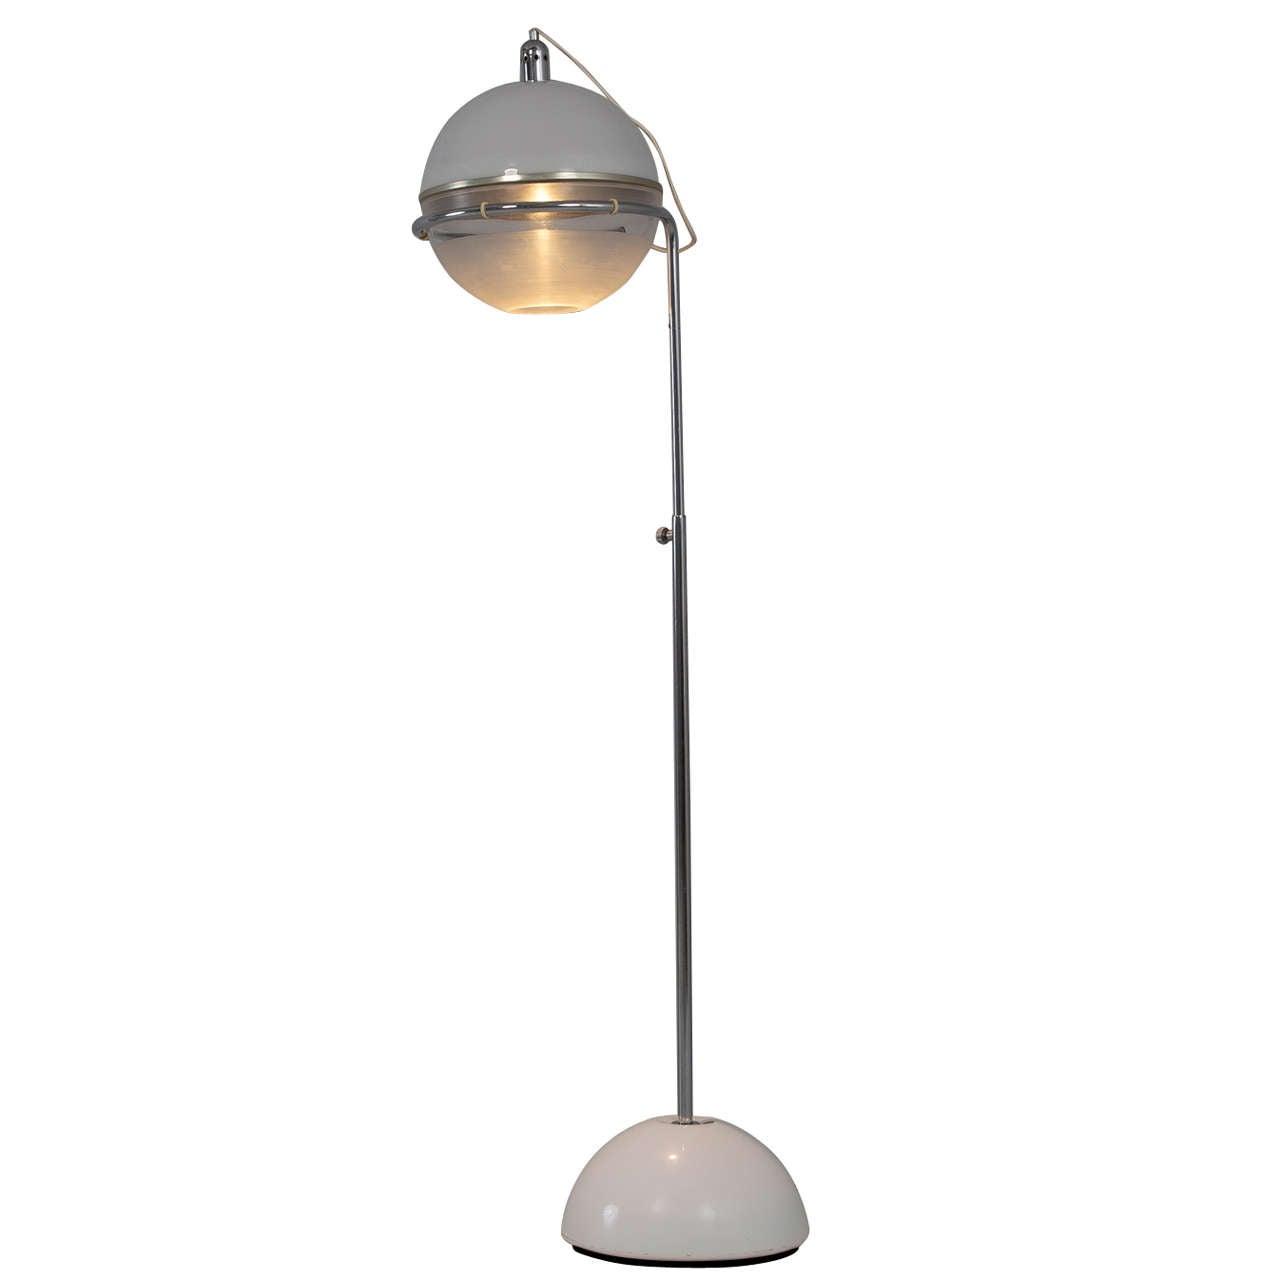 Focus Floor Lamp By Fabio Lenci For Guzzini For Sale At